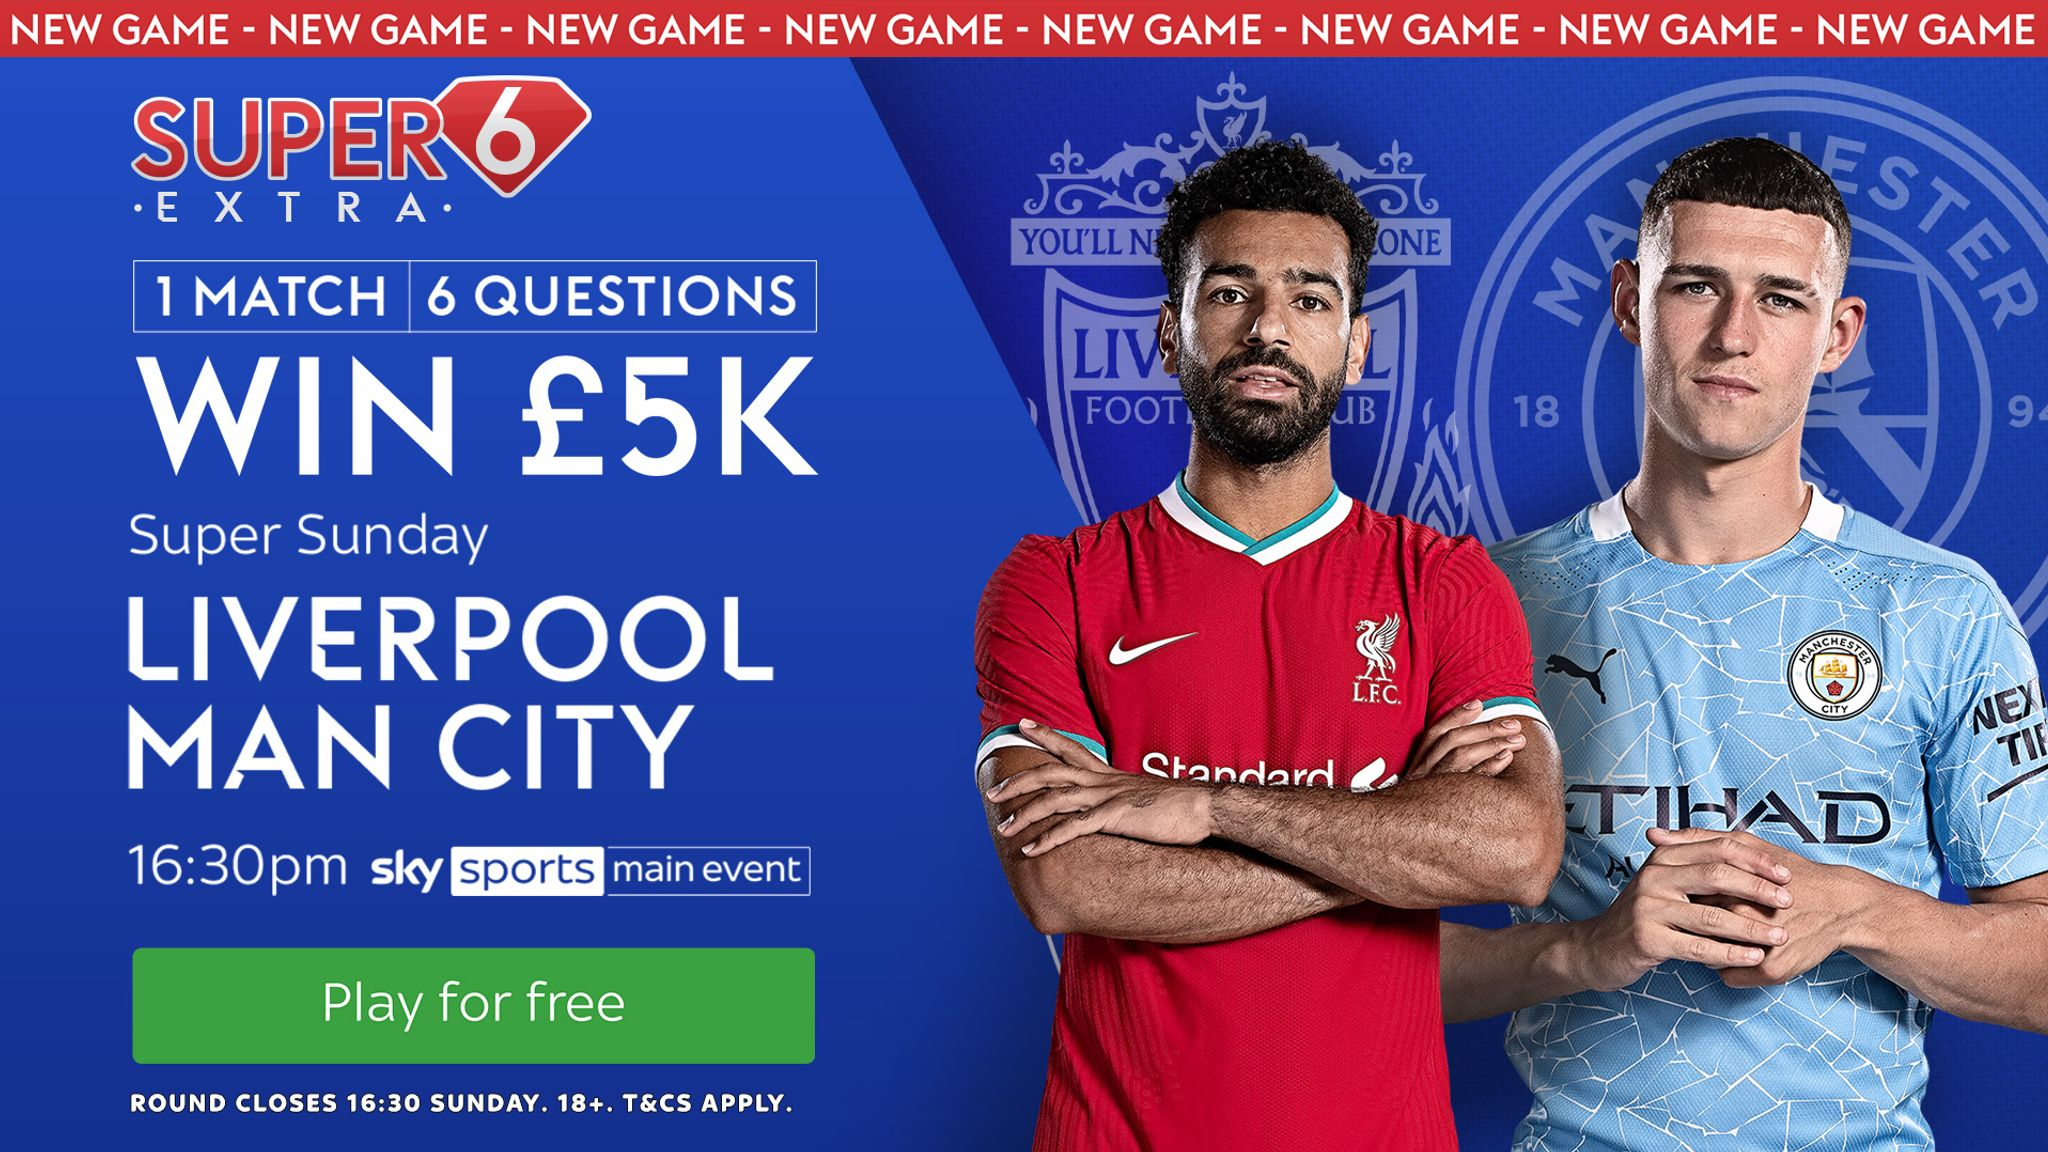 Betting odds premier league 2021/16 explain betting odds 13-8ph